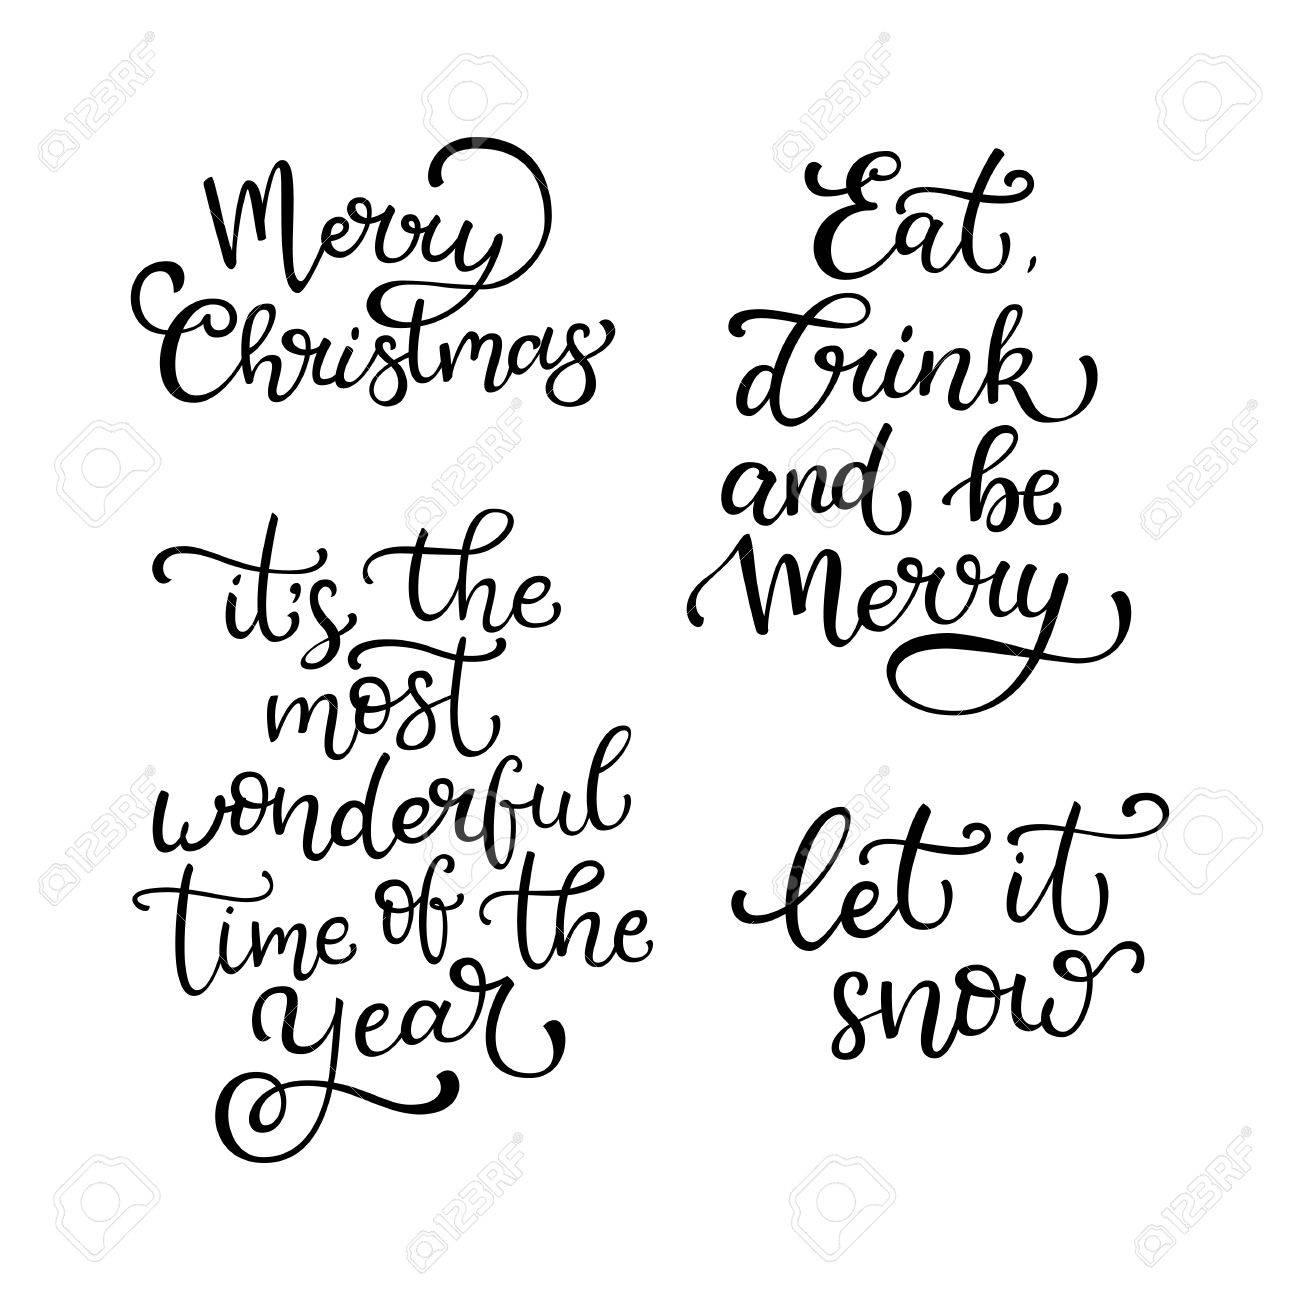 Christmas Sayings For Cards Neologicco large outdoor christmas displays